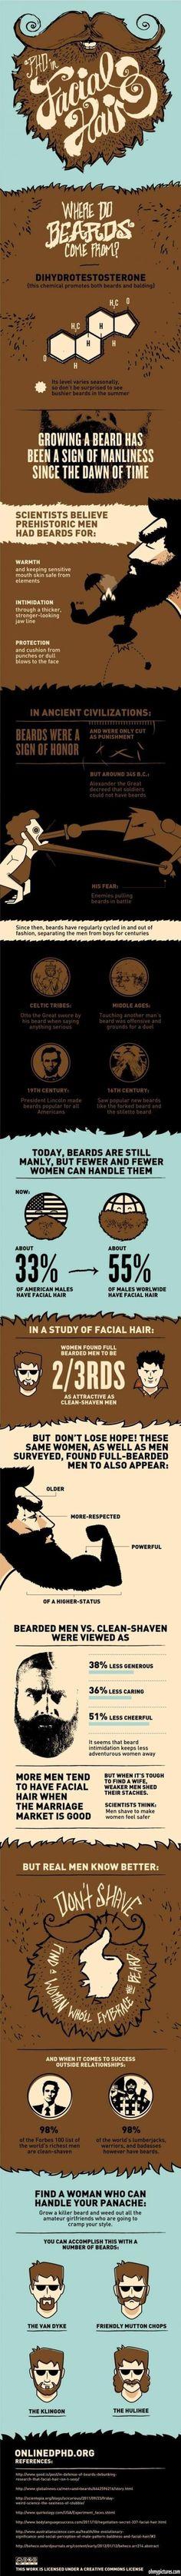 beard facts @Jonathan Nafarrete Walters @Deborah Simon Embrace the beard! Lol!